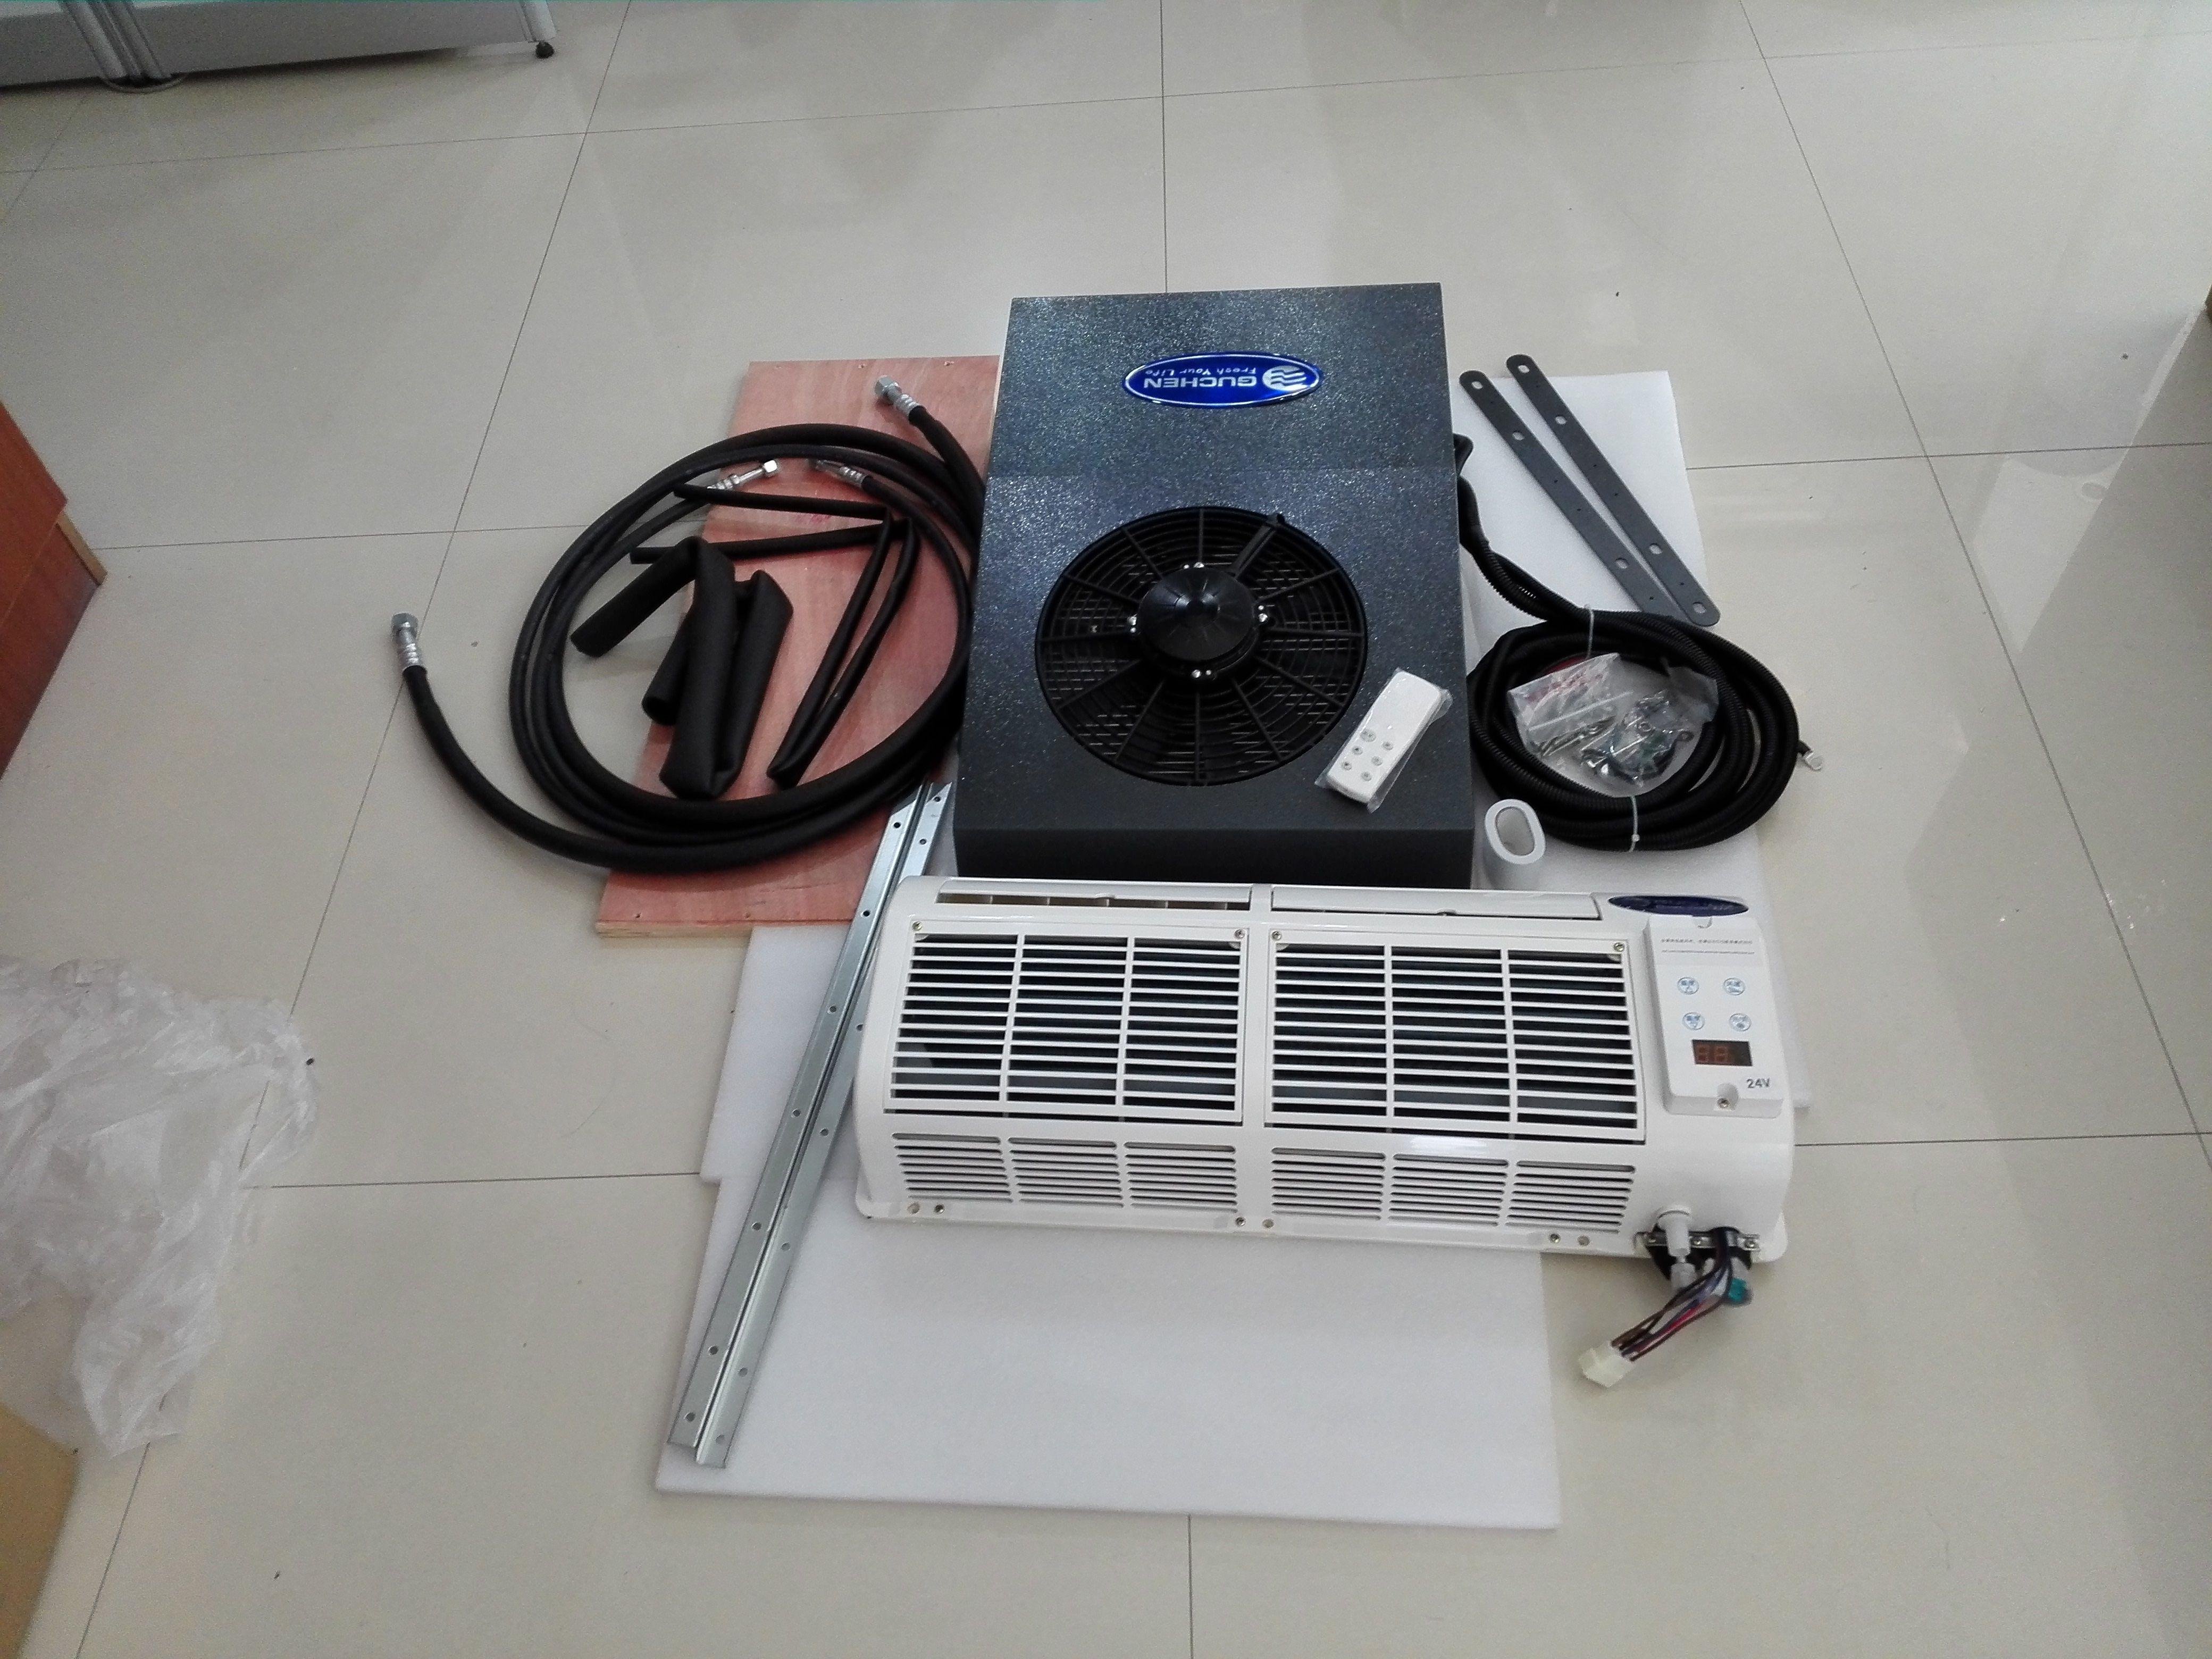 Airpro300b van air conditioner uses low voltage protector